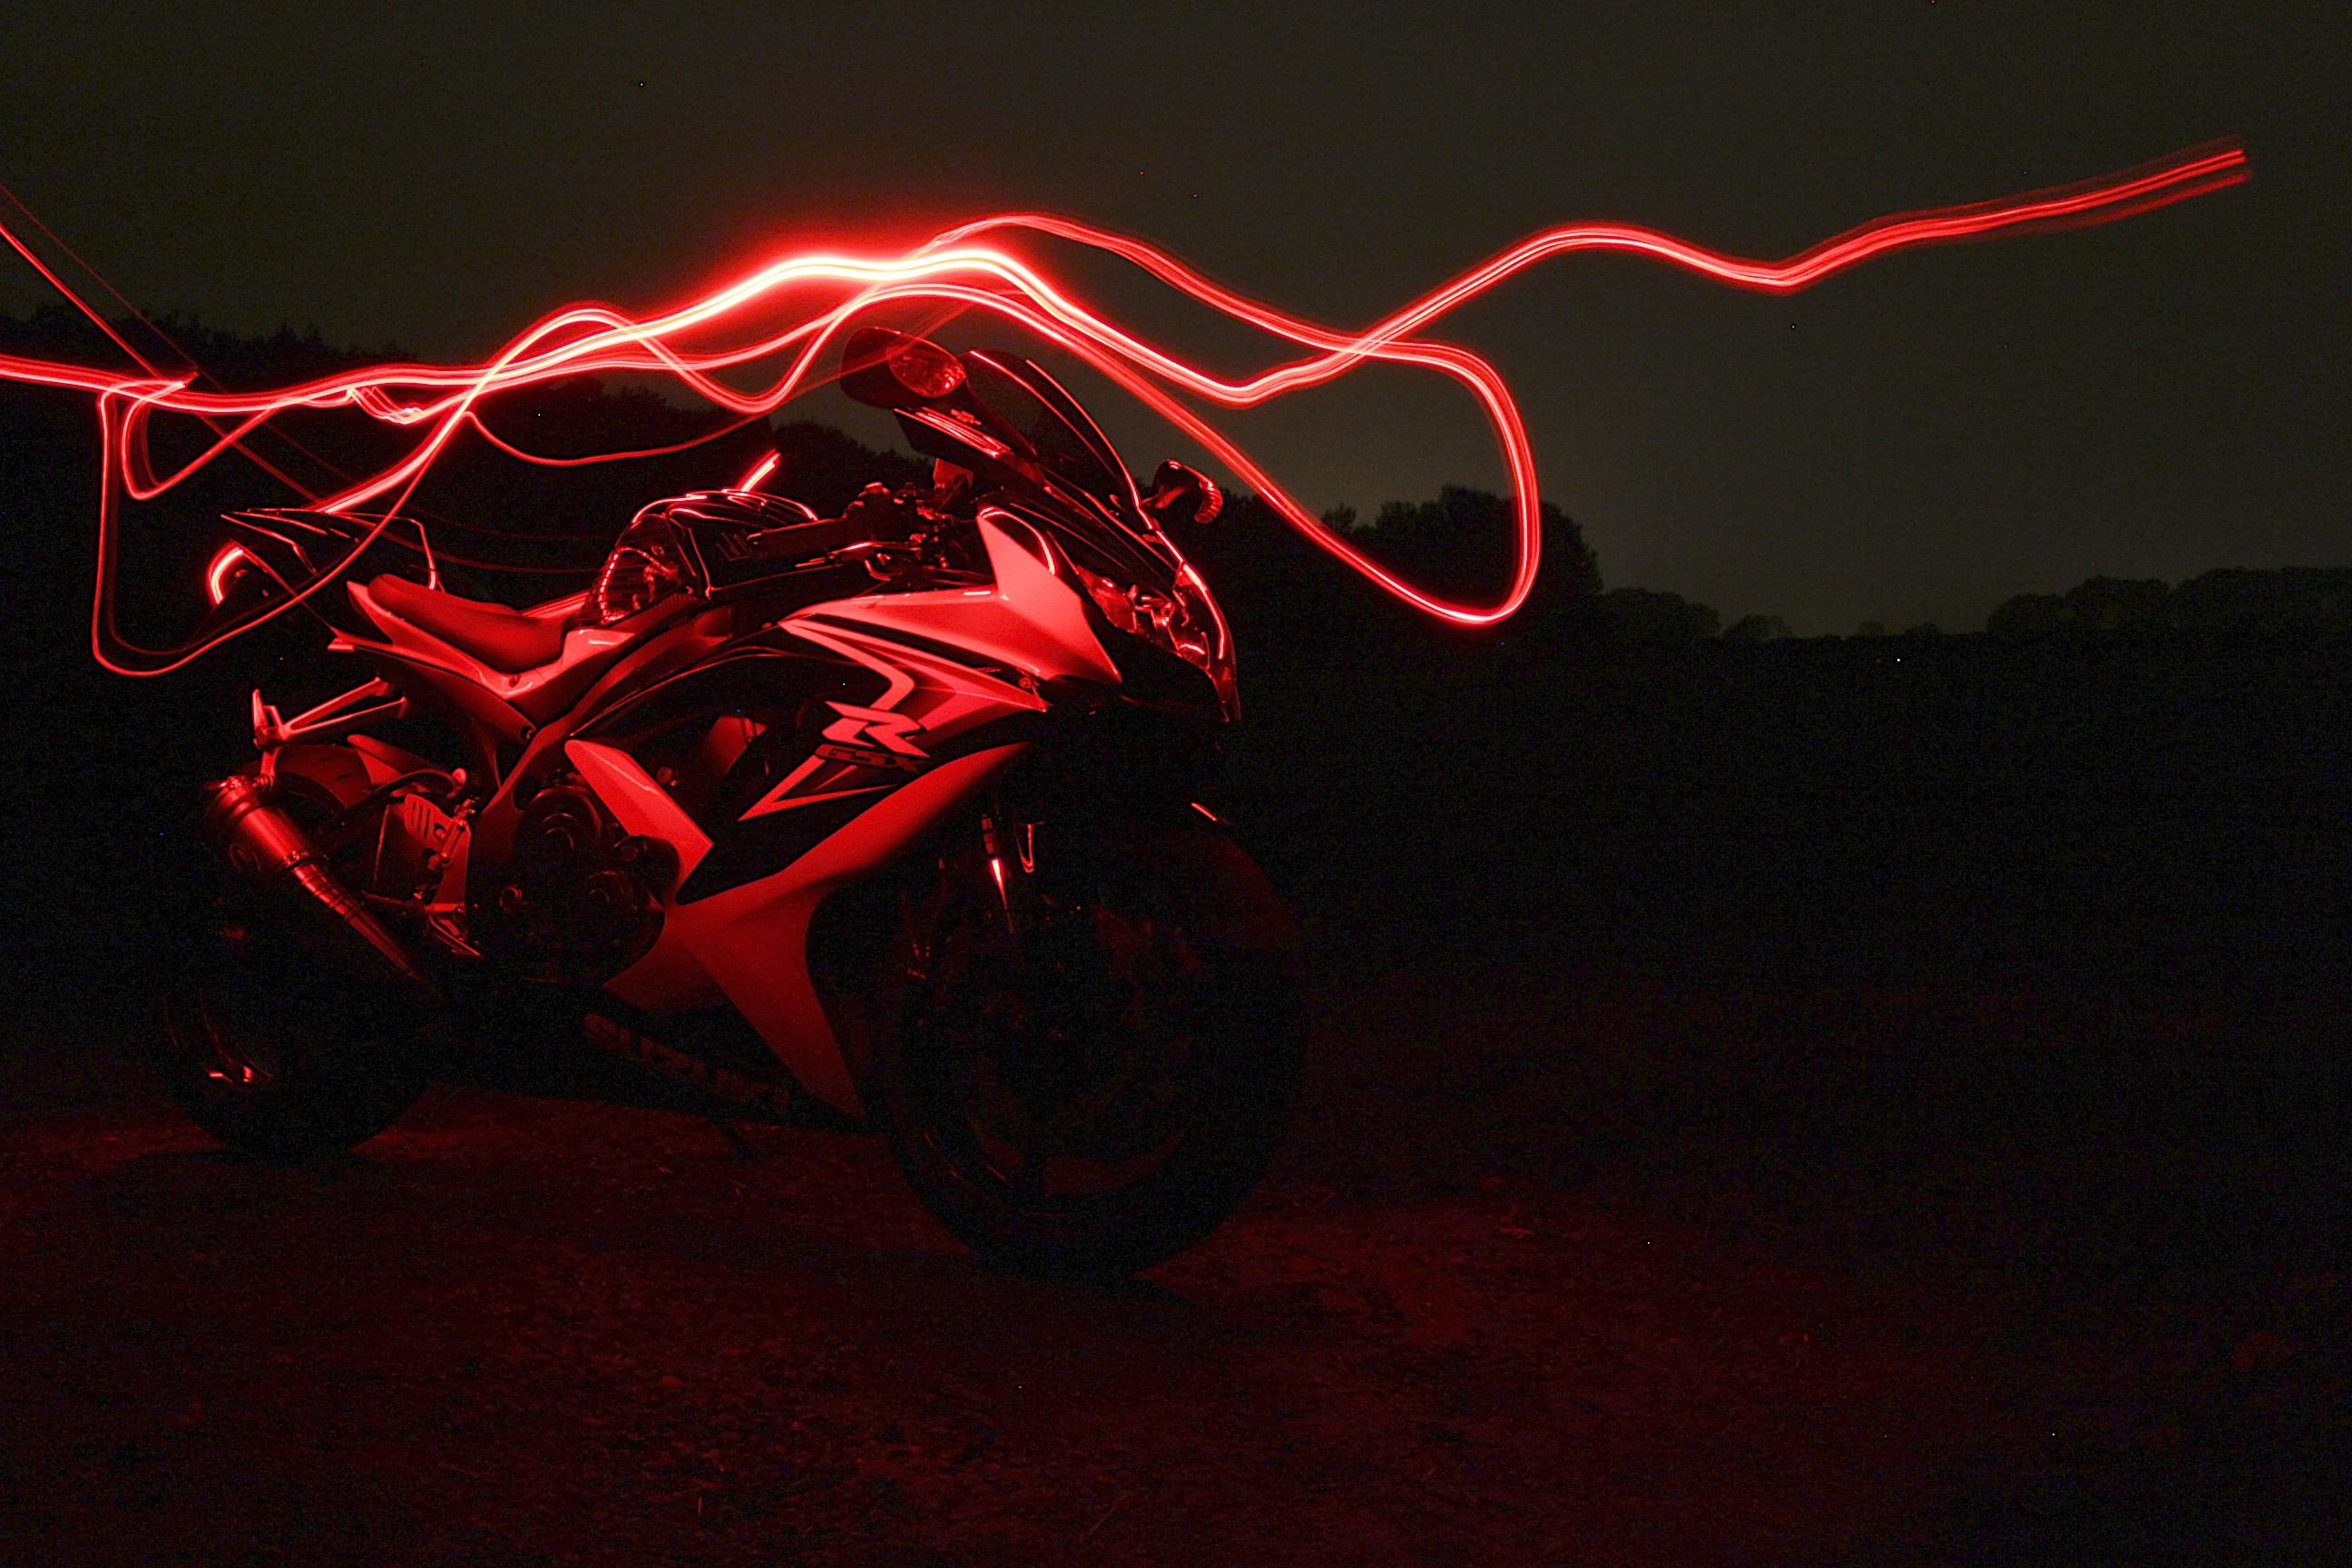 Картинки мотоциклов с неоном